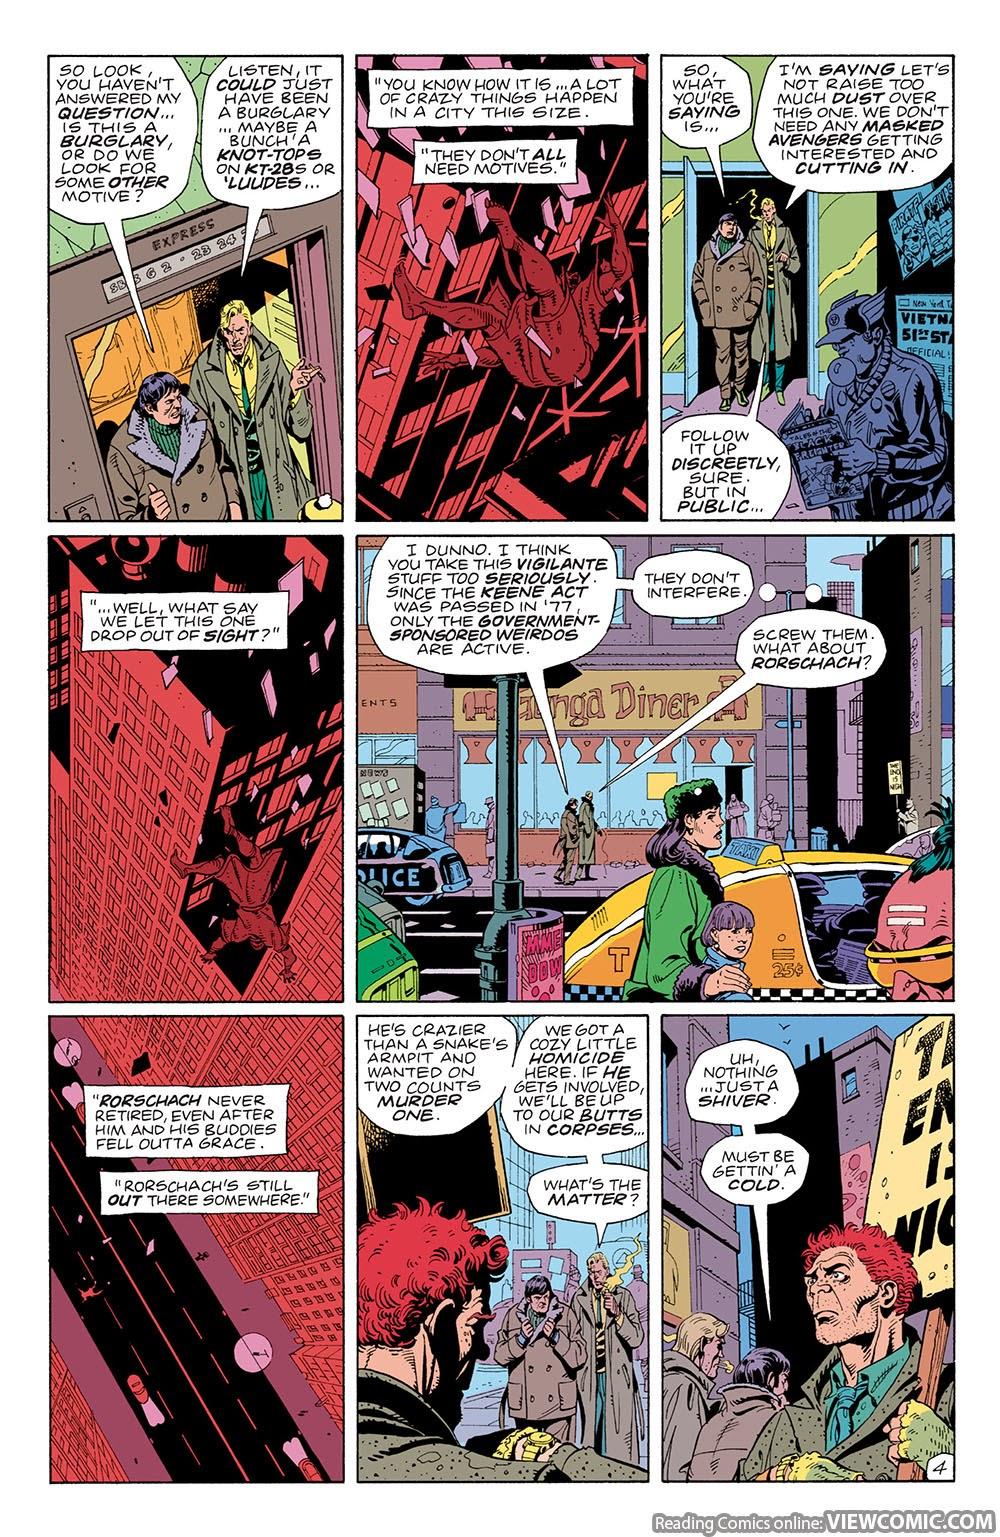 watchmen 01 viewcomic reading comics online for